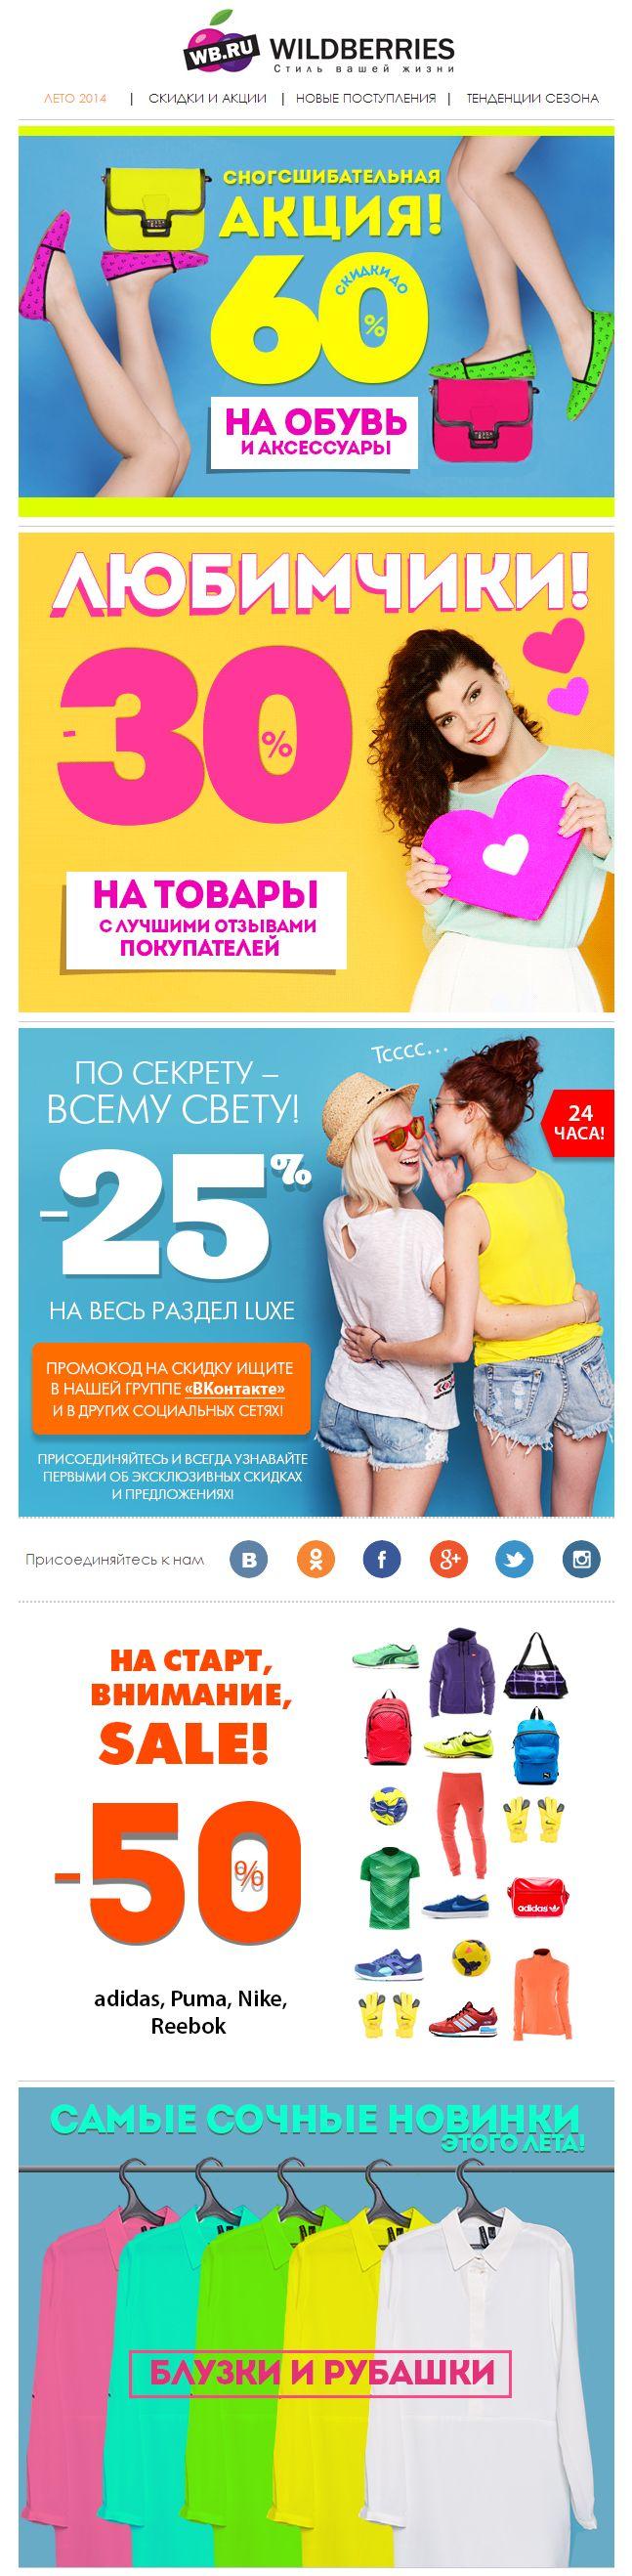 email newsletter #newsletter #design #email #emailnewsletter #layout…